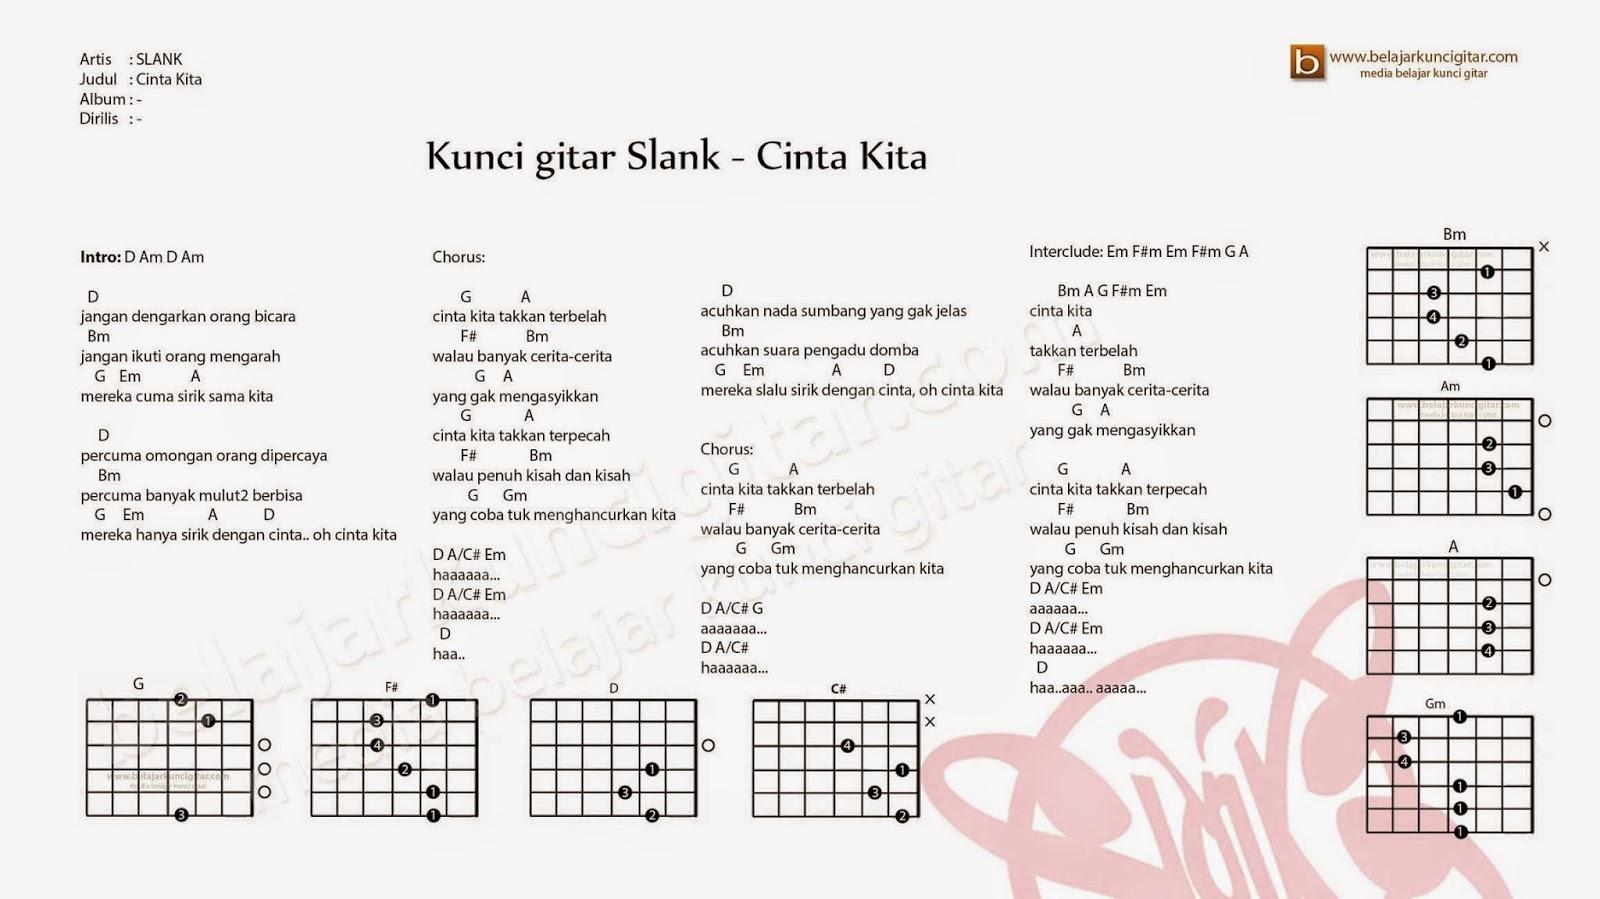 Kunci Gitar Slank Cinta Kita Lirik Dan Kunci Gitar Slank Cinta Kita Ost Get Married 2 Kunci Gitar Slank Cinta Kita Belajar Kunci Gitar